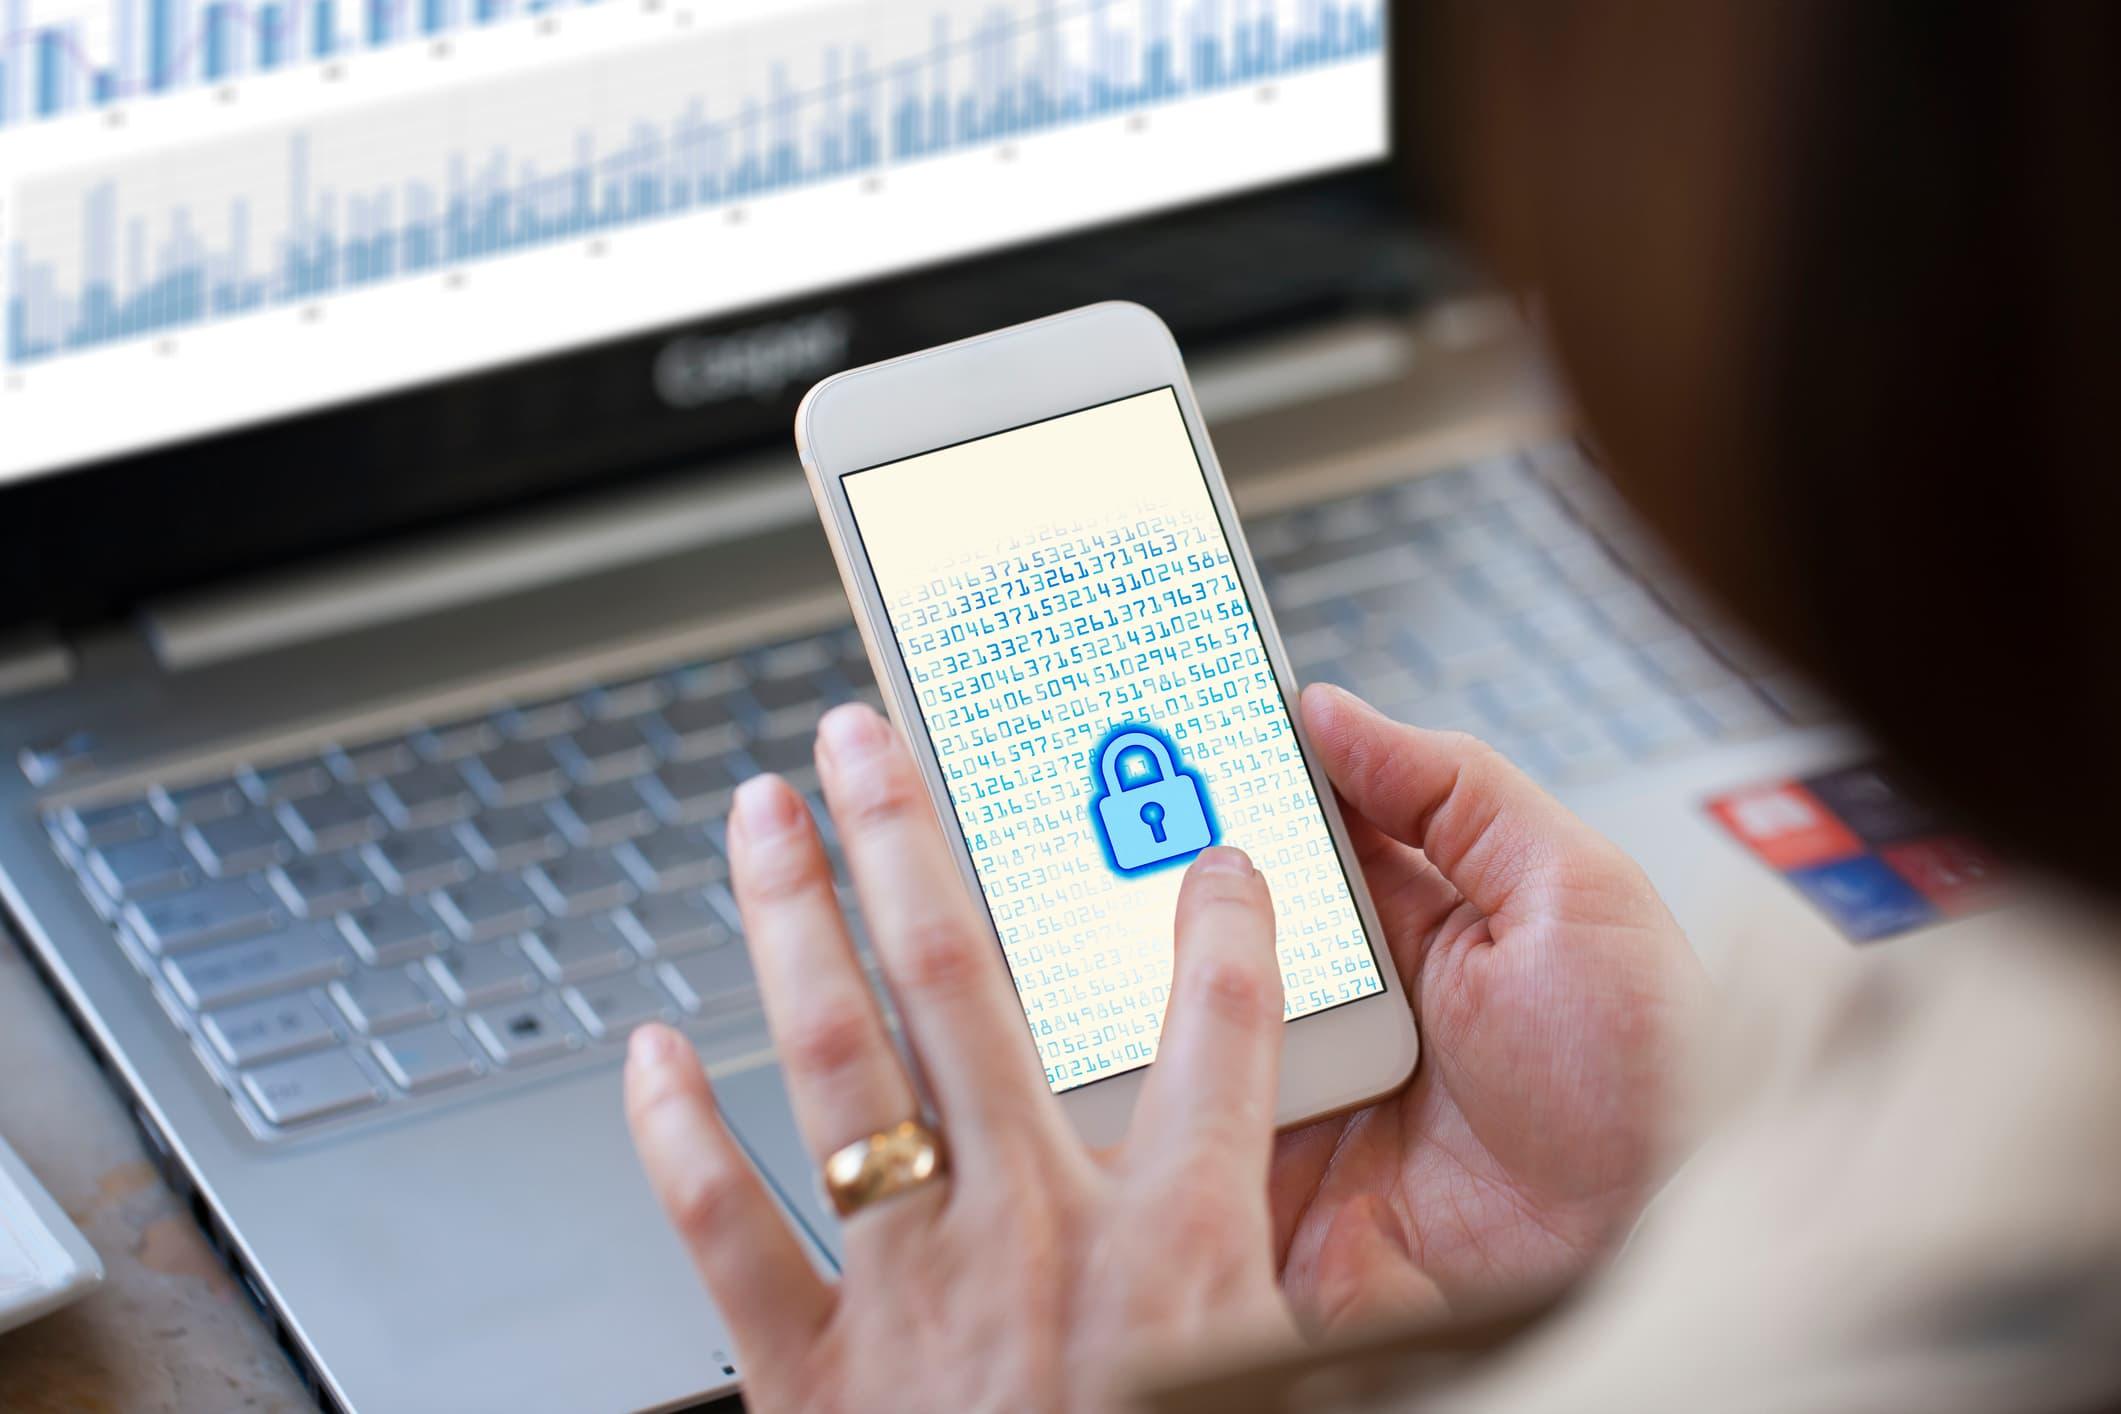 webinar-multi-factor-authentication-its-no-longer-optional